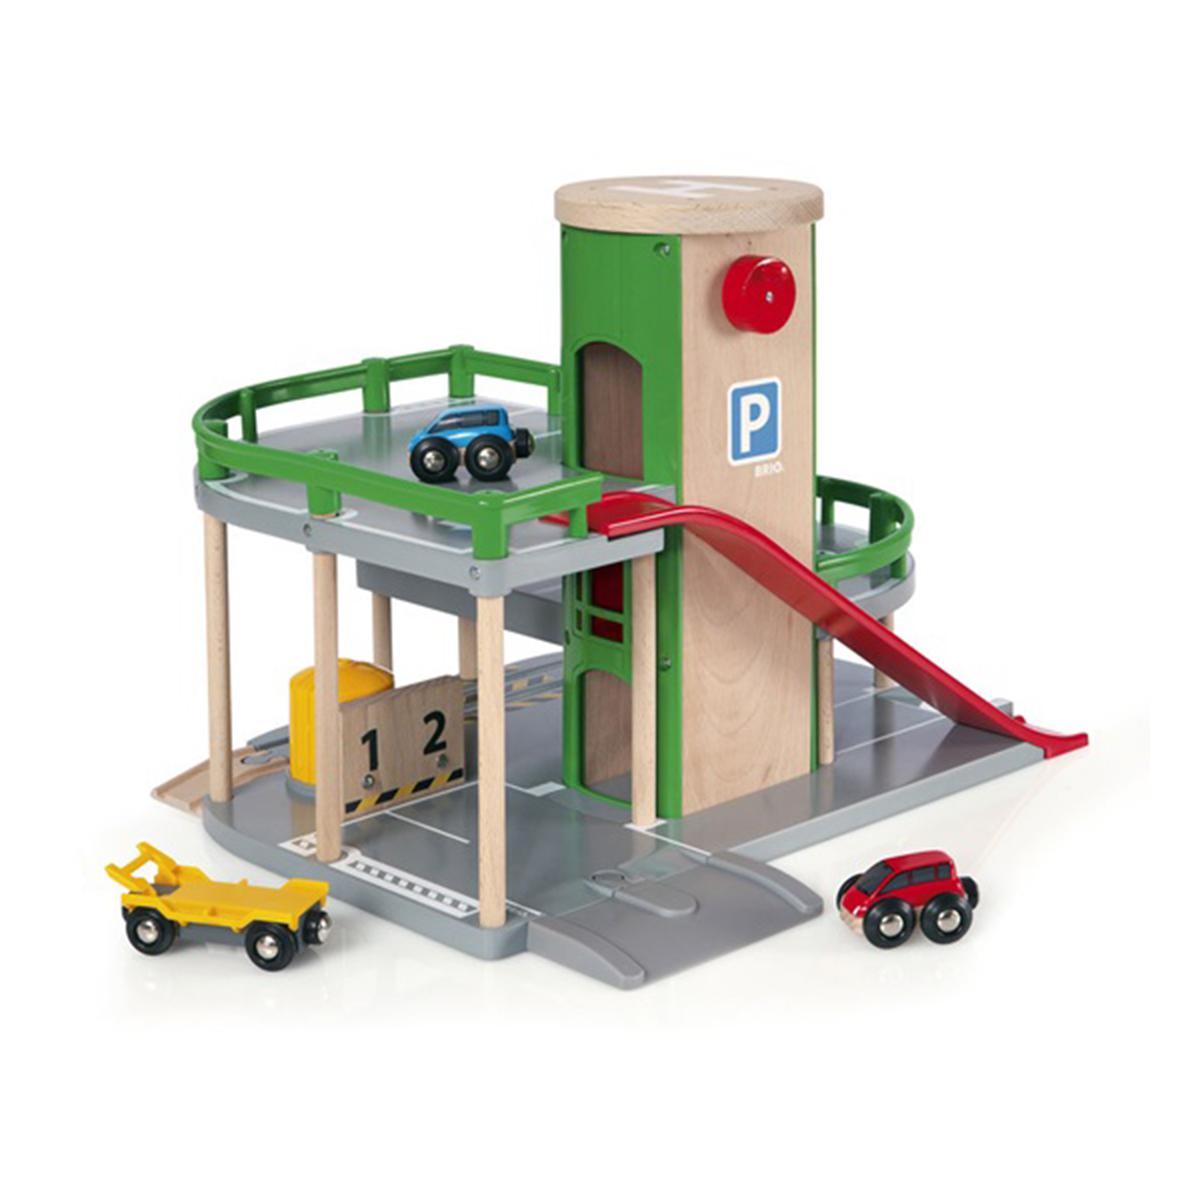 Garage rail/route - Brio